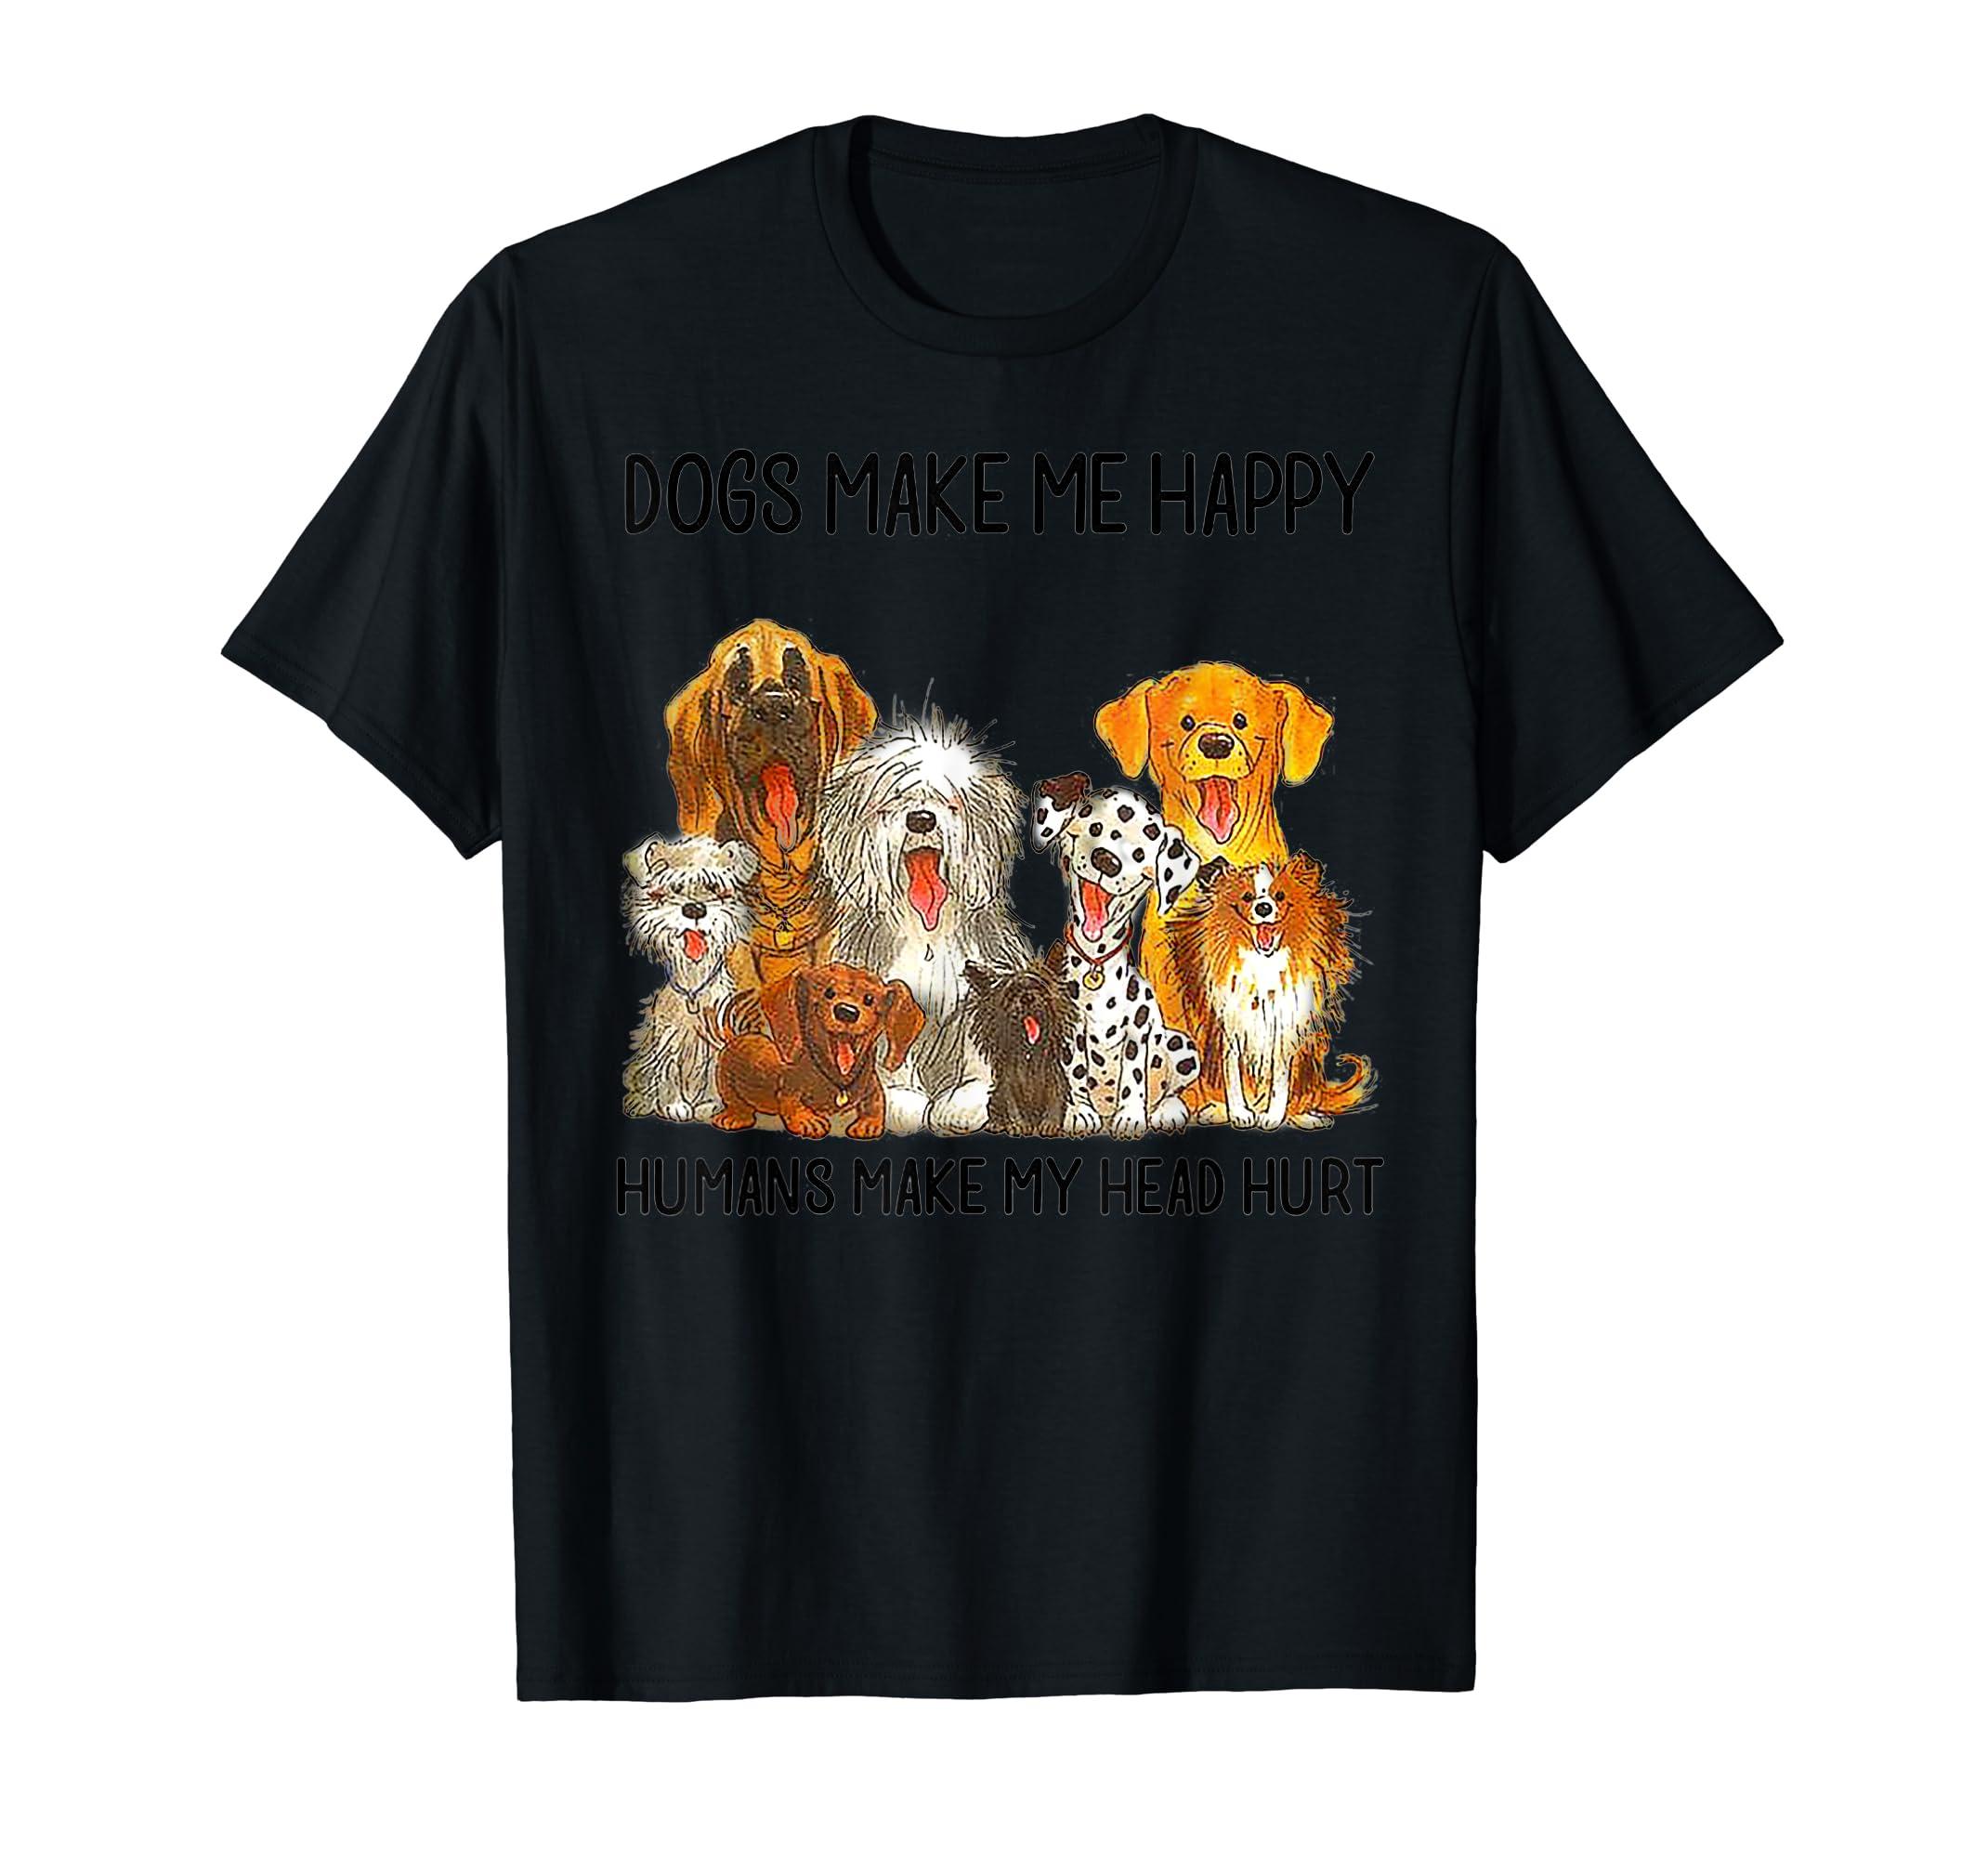 Dogs Make Me Happy Humans Make My Head Hurt Tshirt-Men's T-Shirt-Black